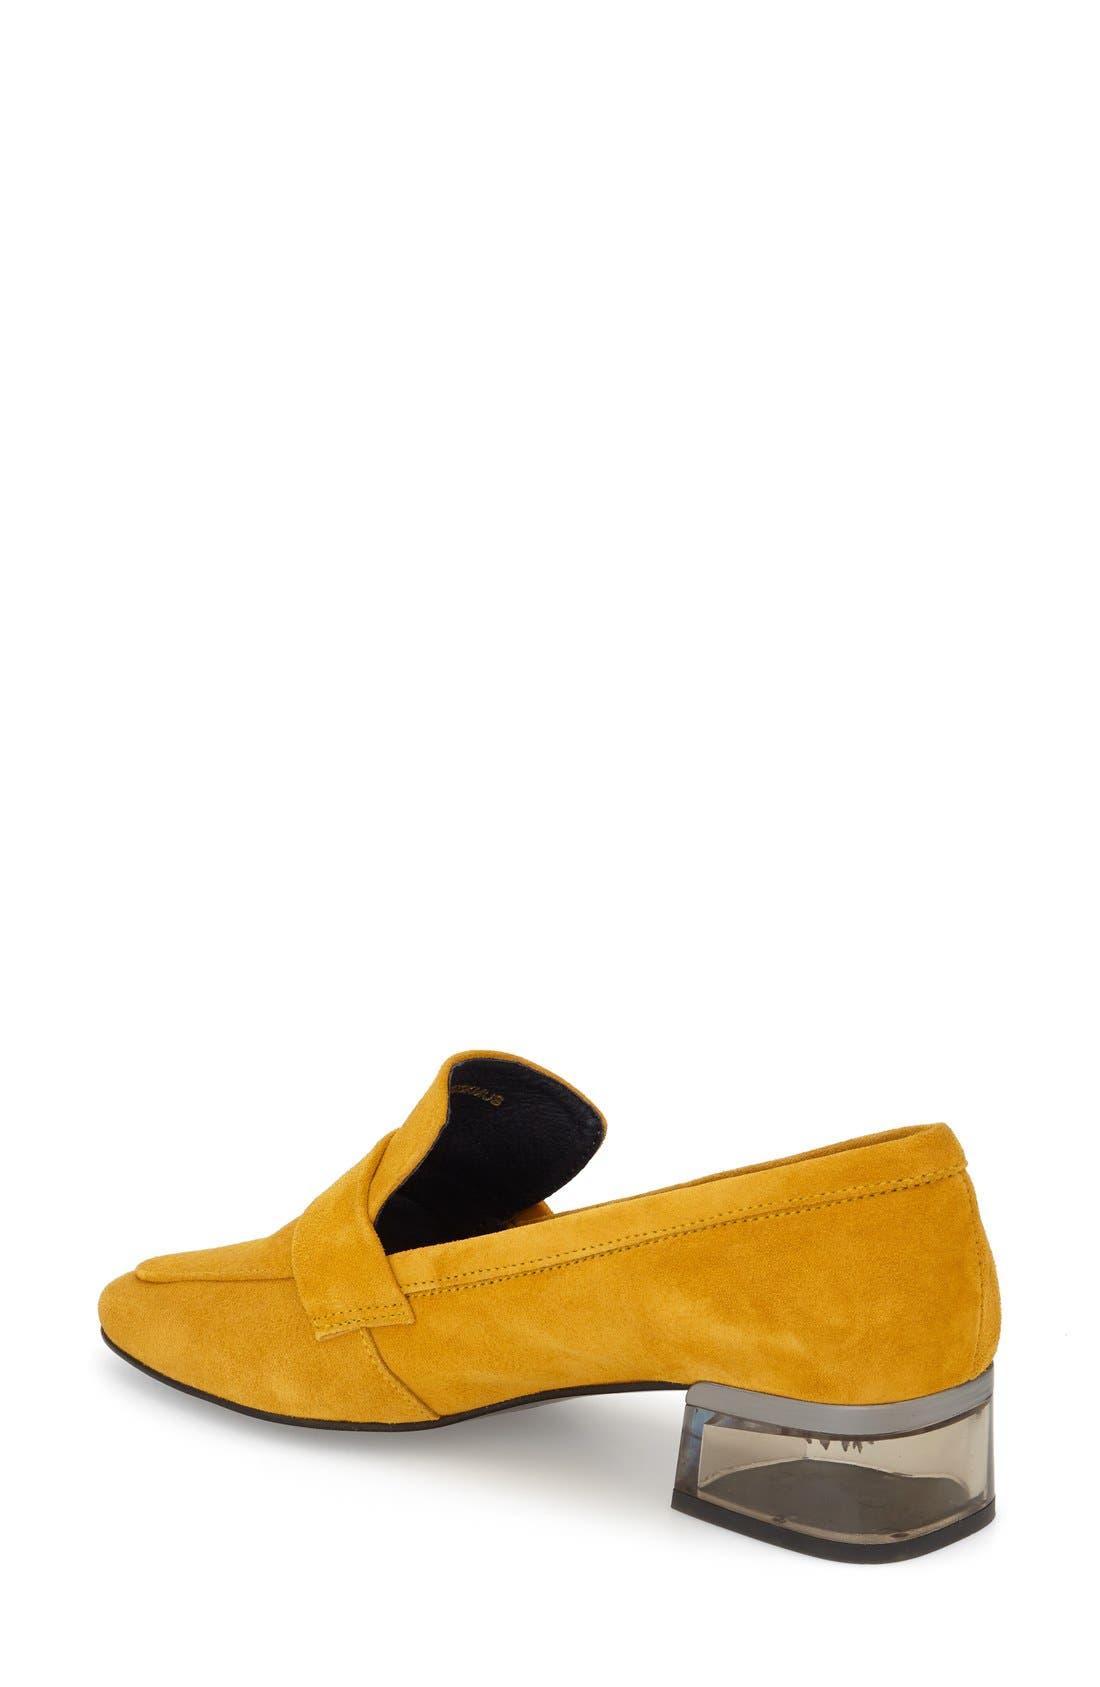 Alternate Image 2  - Topshop 'Karrot' Clear Heel Loafer (Women)